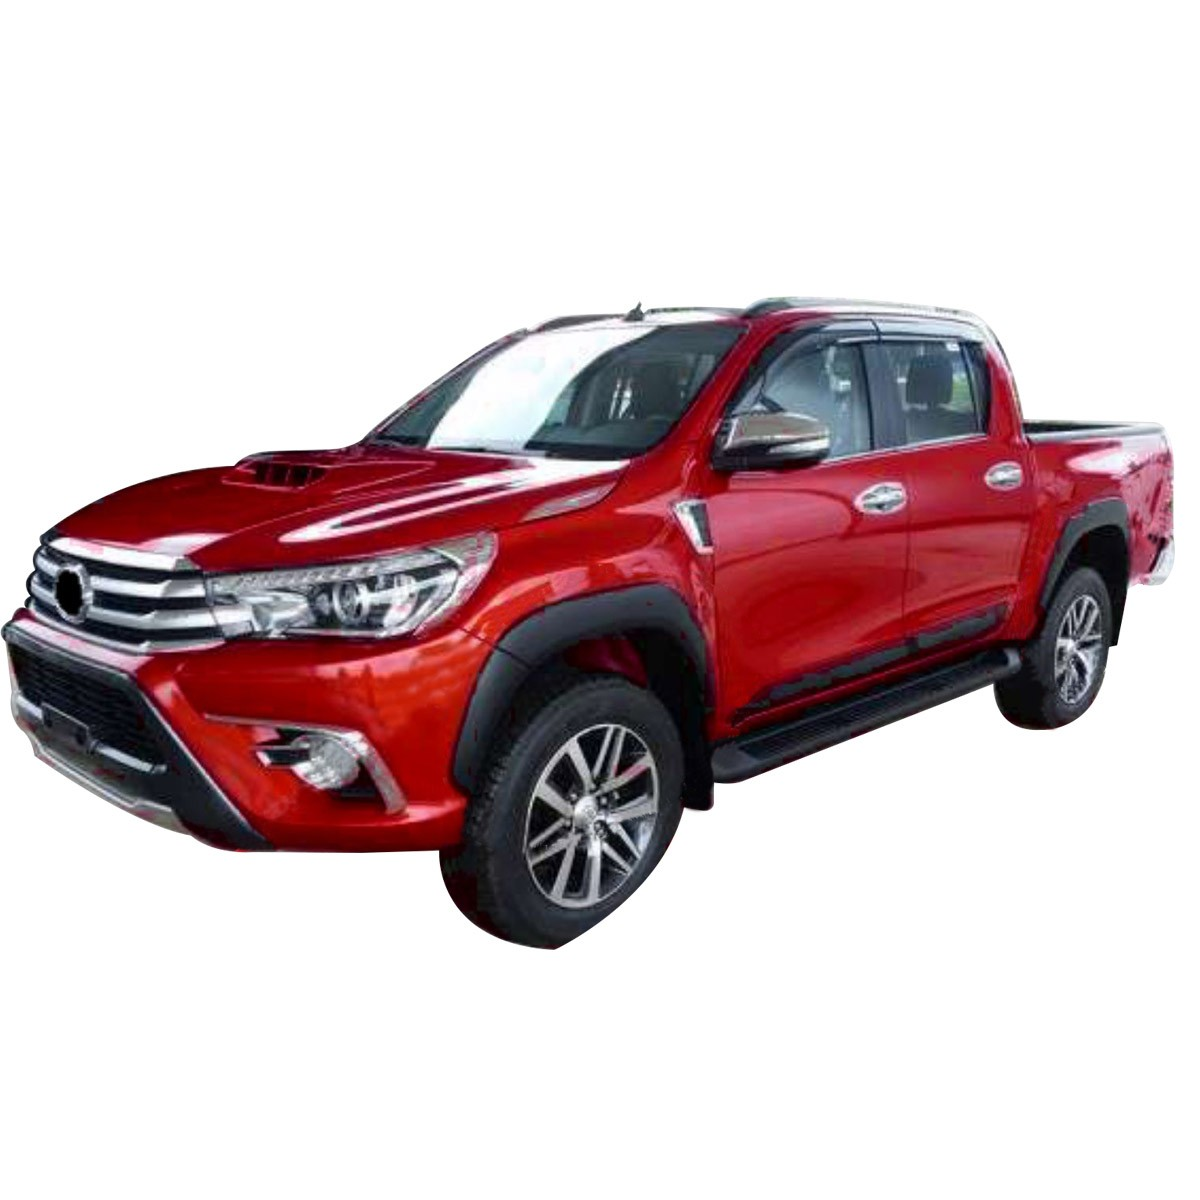 Alargador De Paralamas Original Oem Toyota Hilux 2016 A 2019